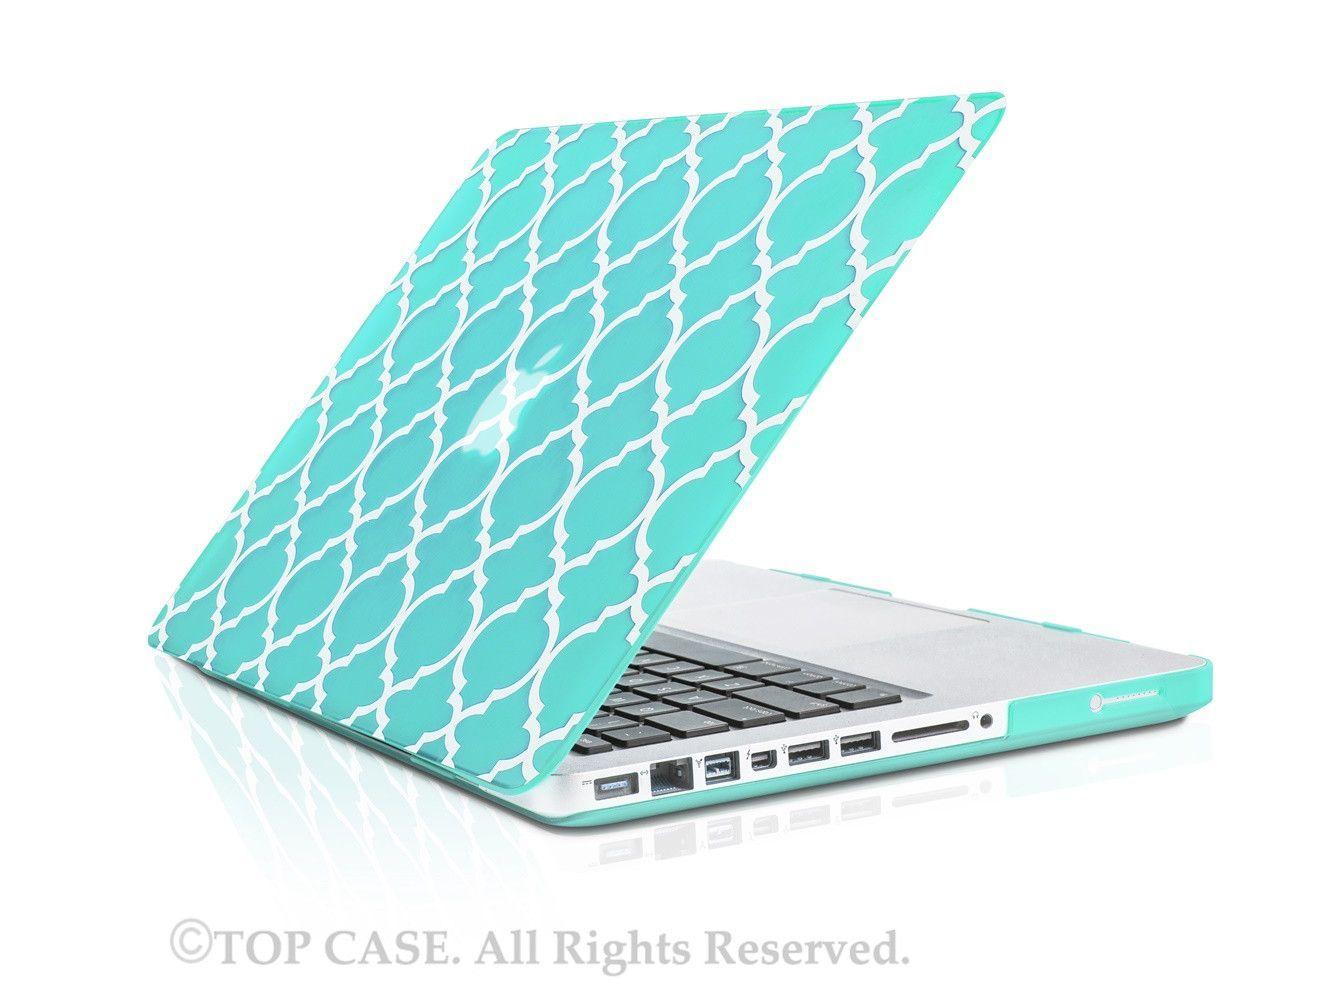 Macbook pro with retina display cases macbook pro retina cases - Quatrefoil Moroccan Trellis Hot Blue Turquoise Hard Case For Macbook Pro 15